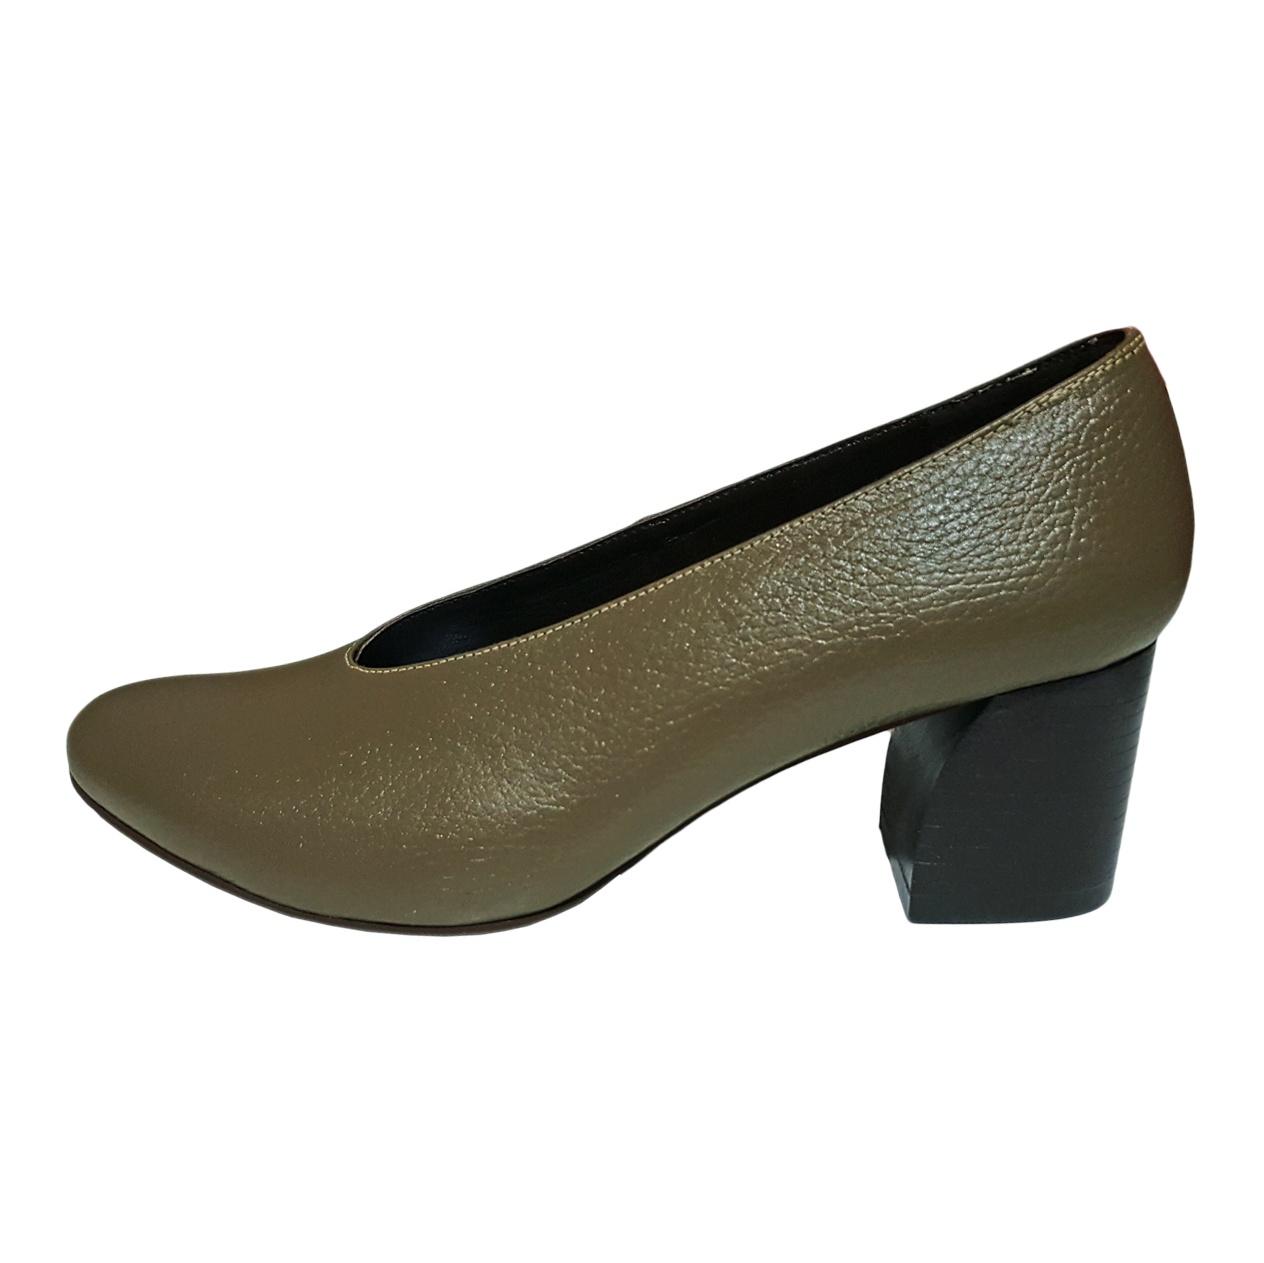 کفش زنانه  کد 1104-1